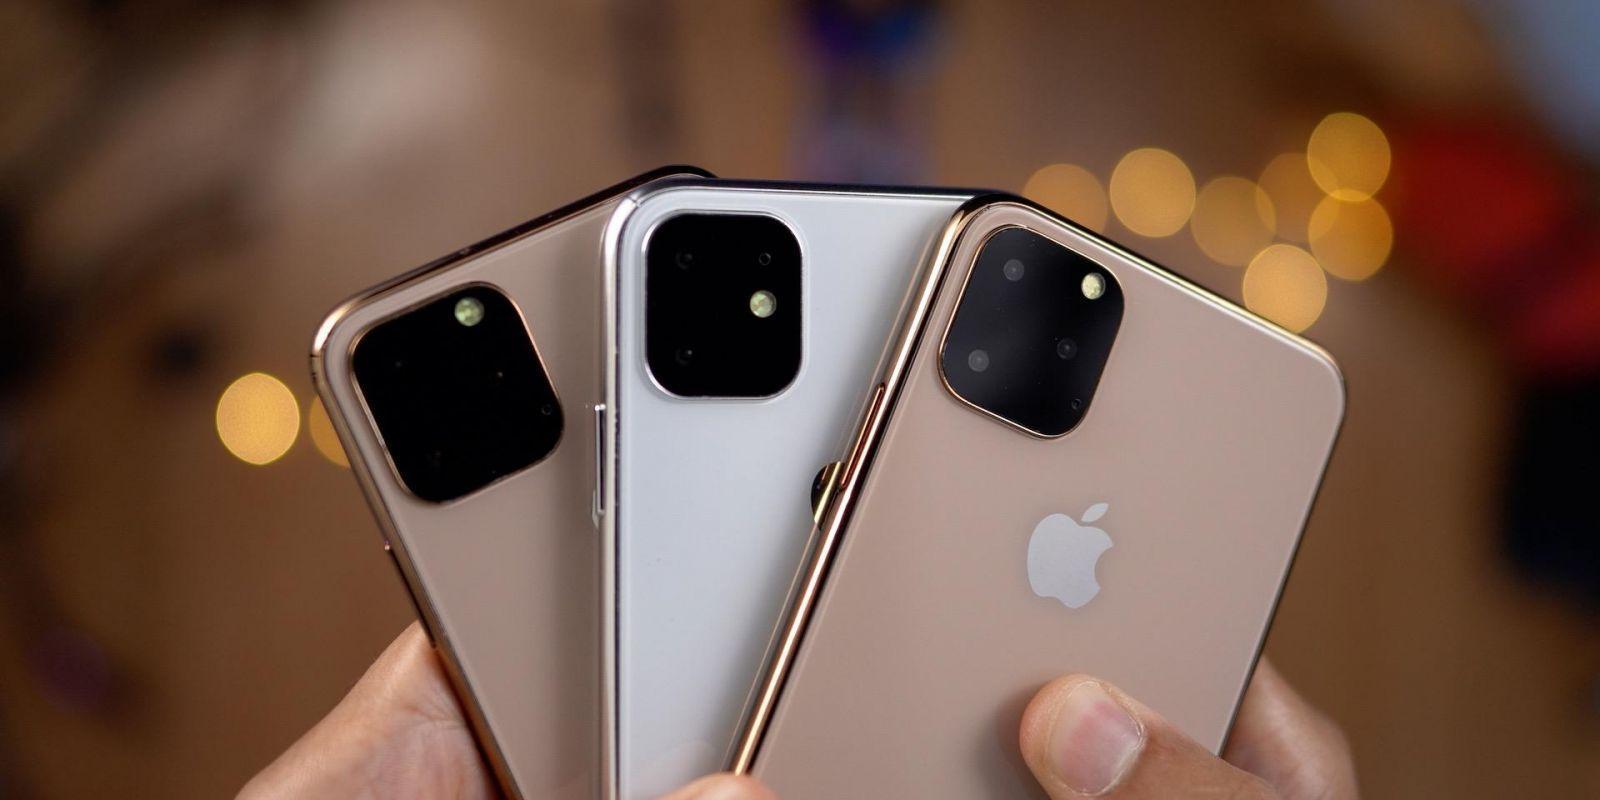 iPhone 11 и что ещё покажут на презентации Apple 10 сентября? (169)